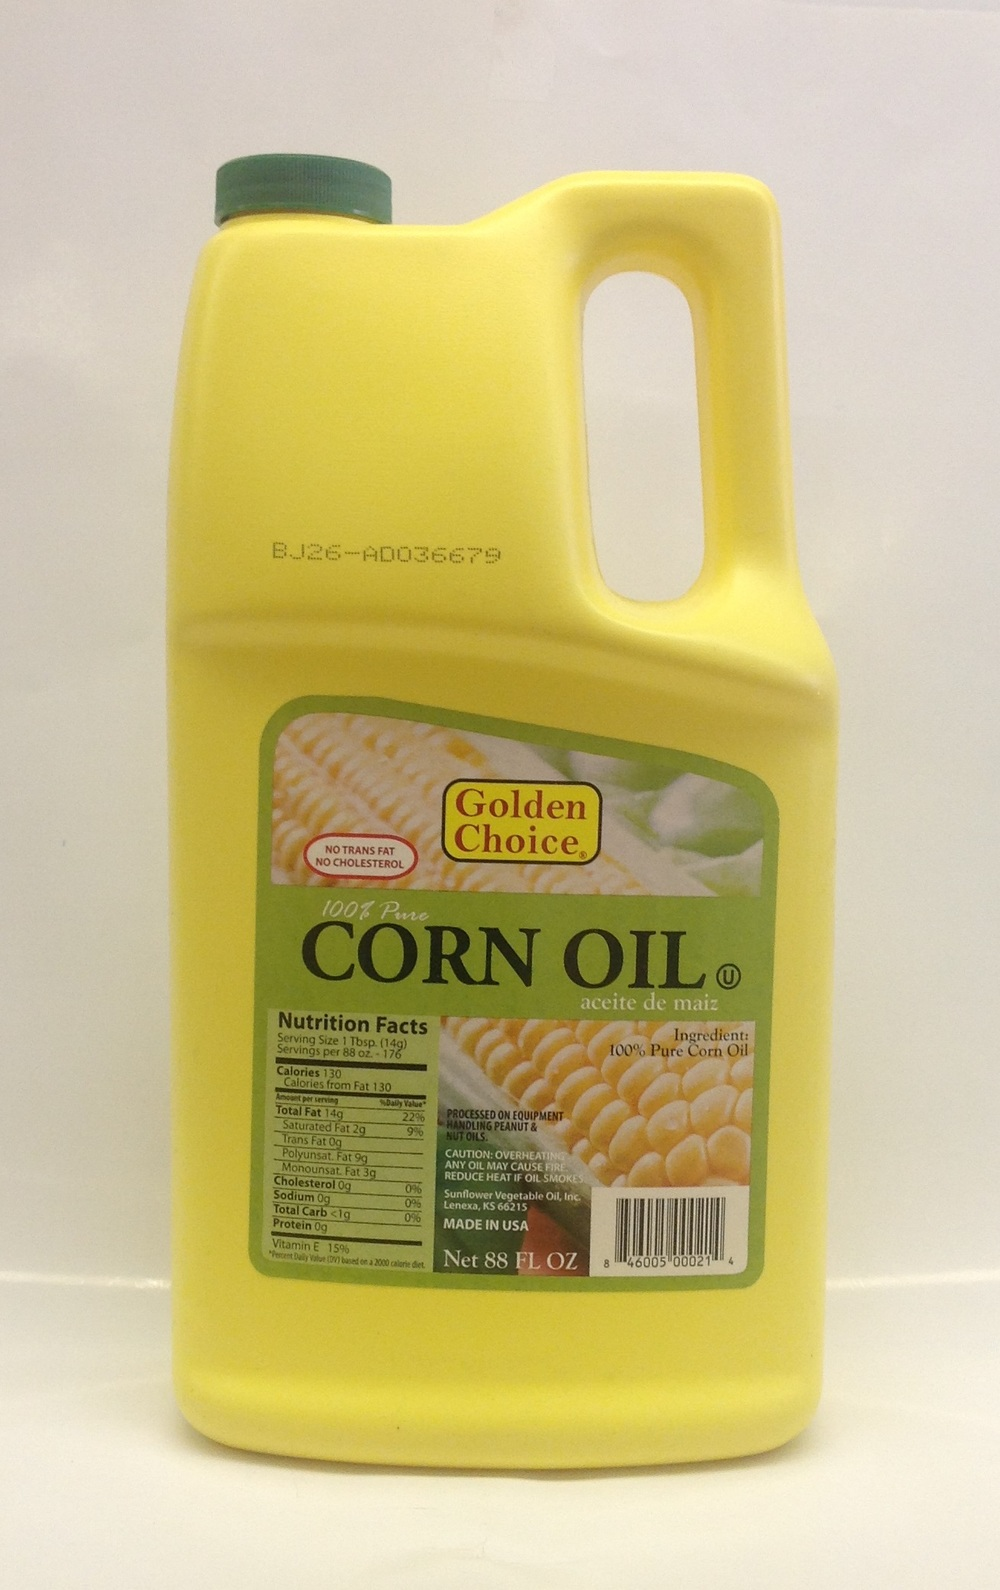 Corn Oil   Golden Choice   OIL0999 8x88 oz